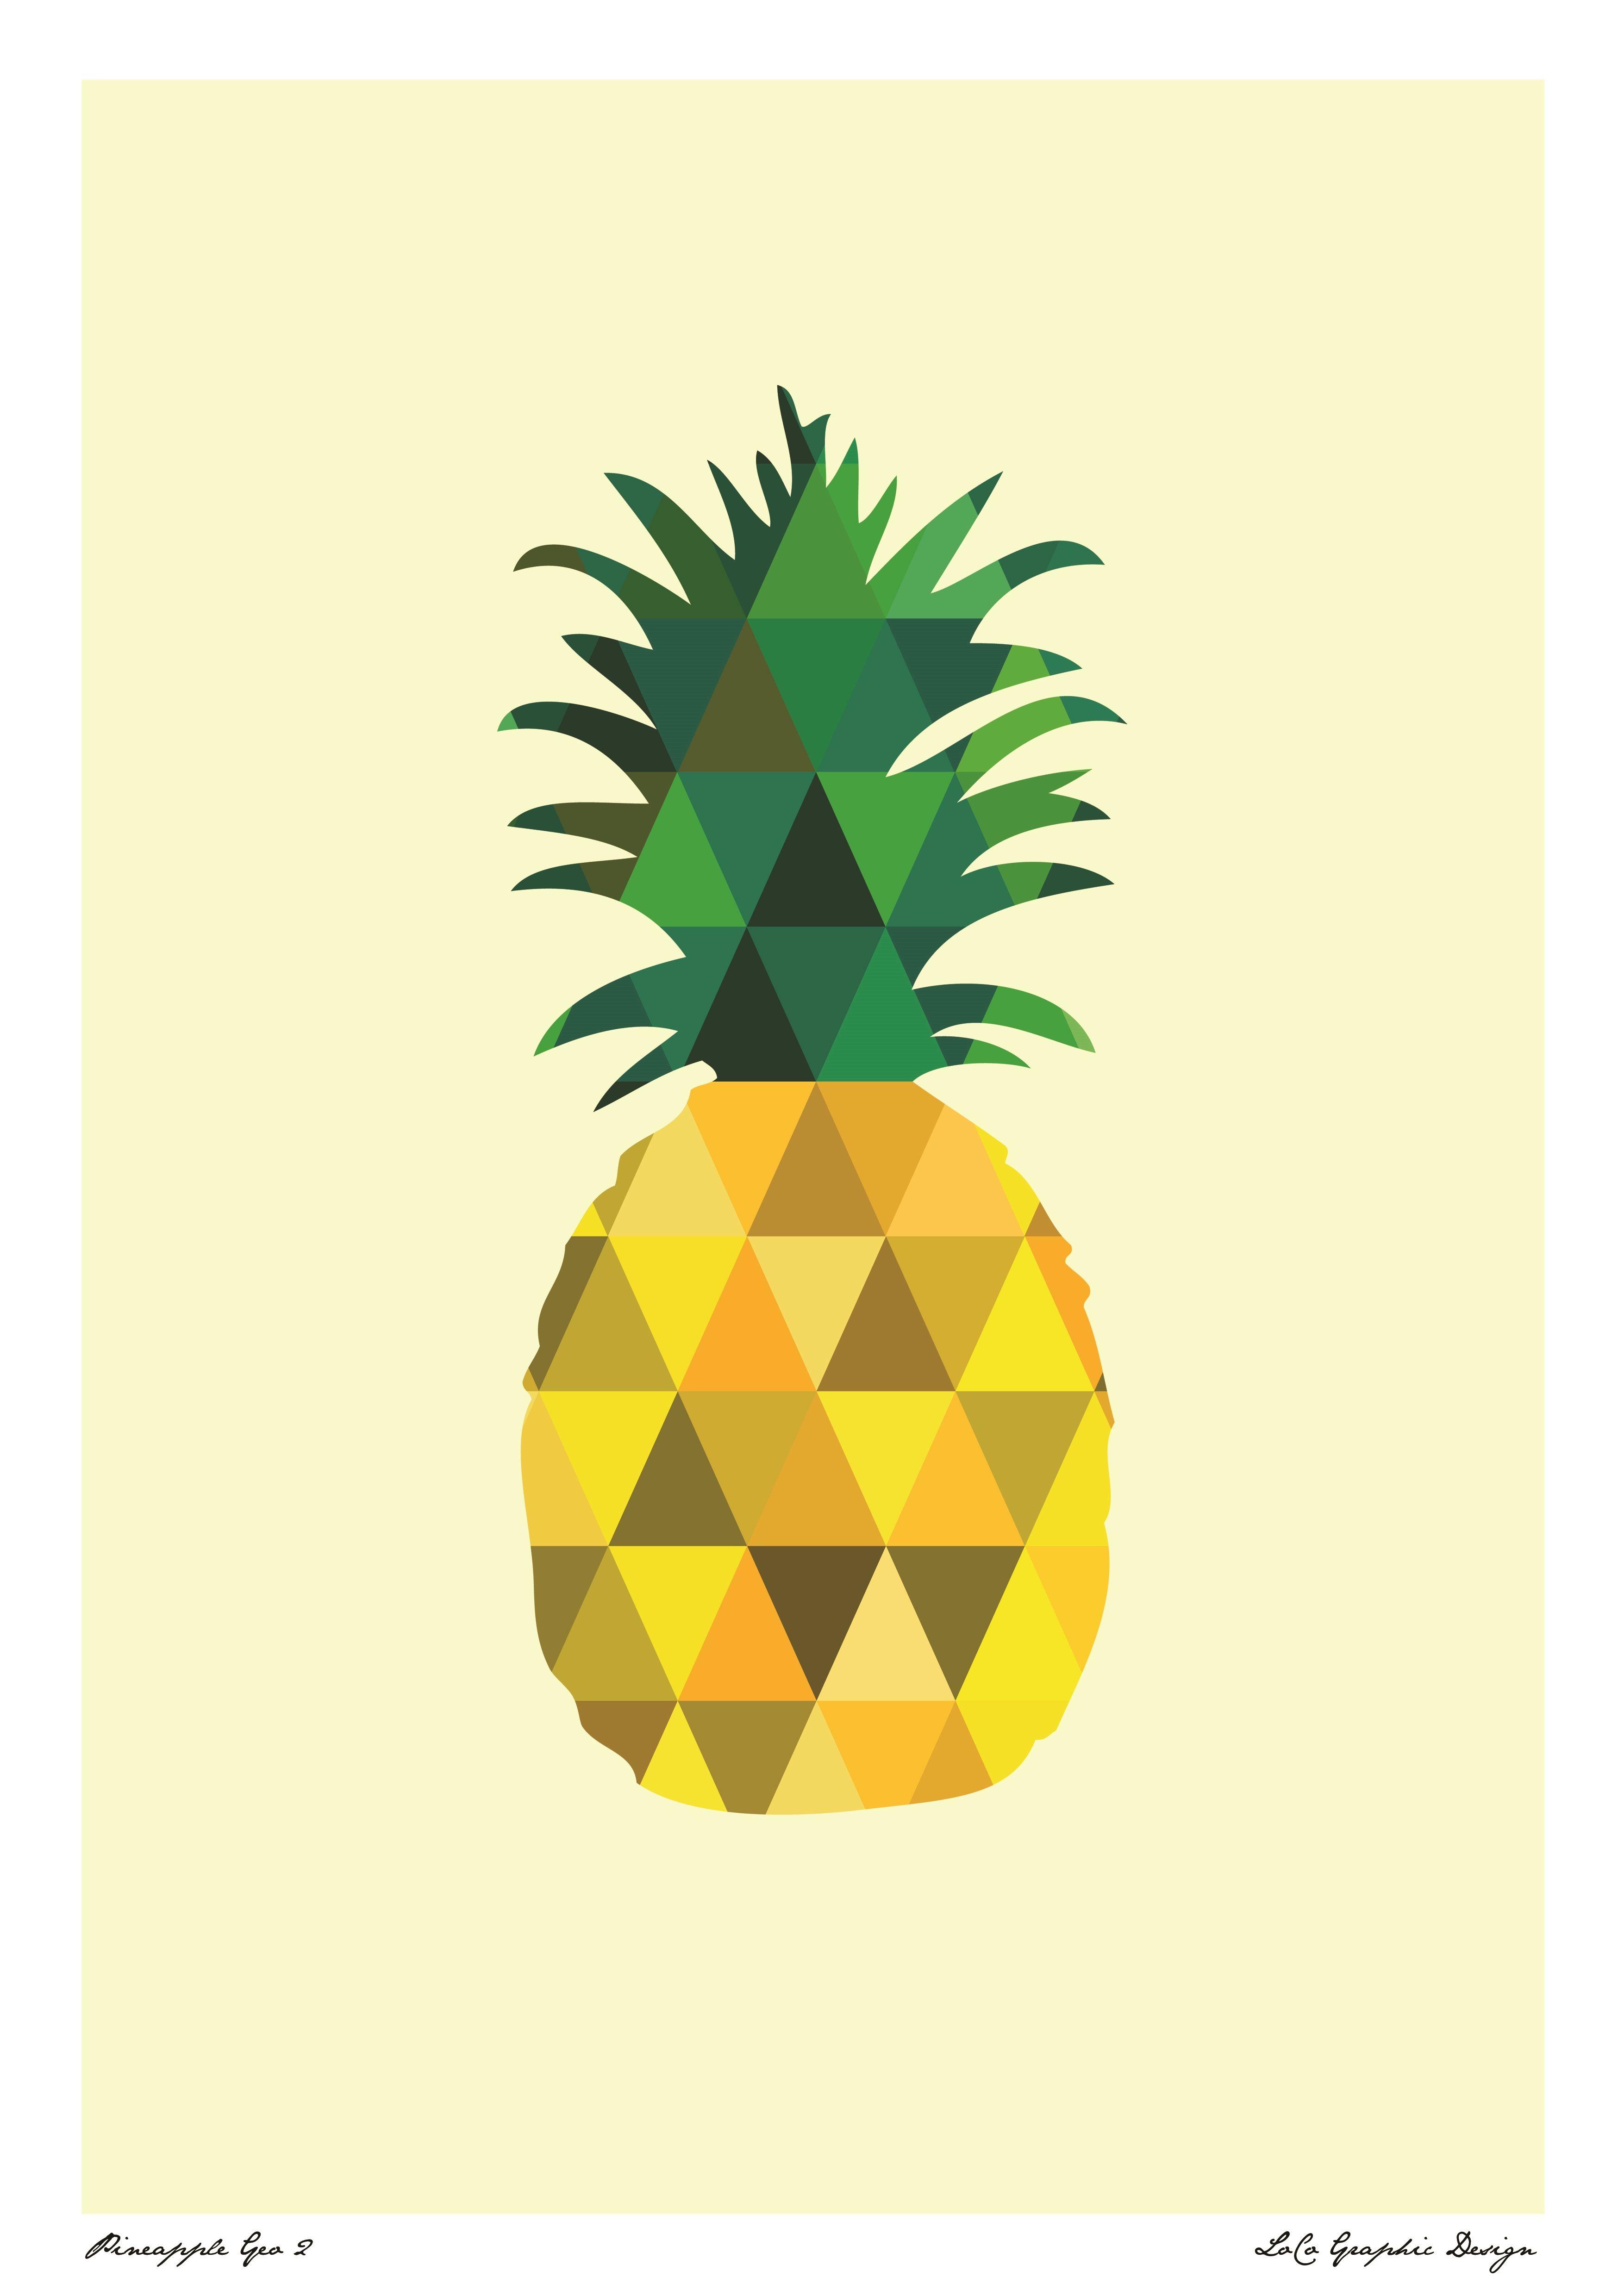 Pineapple Graphic Design